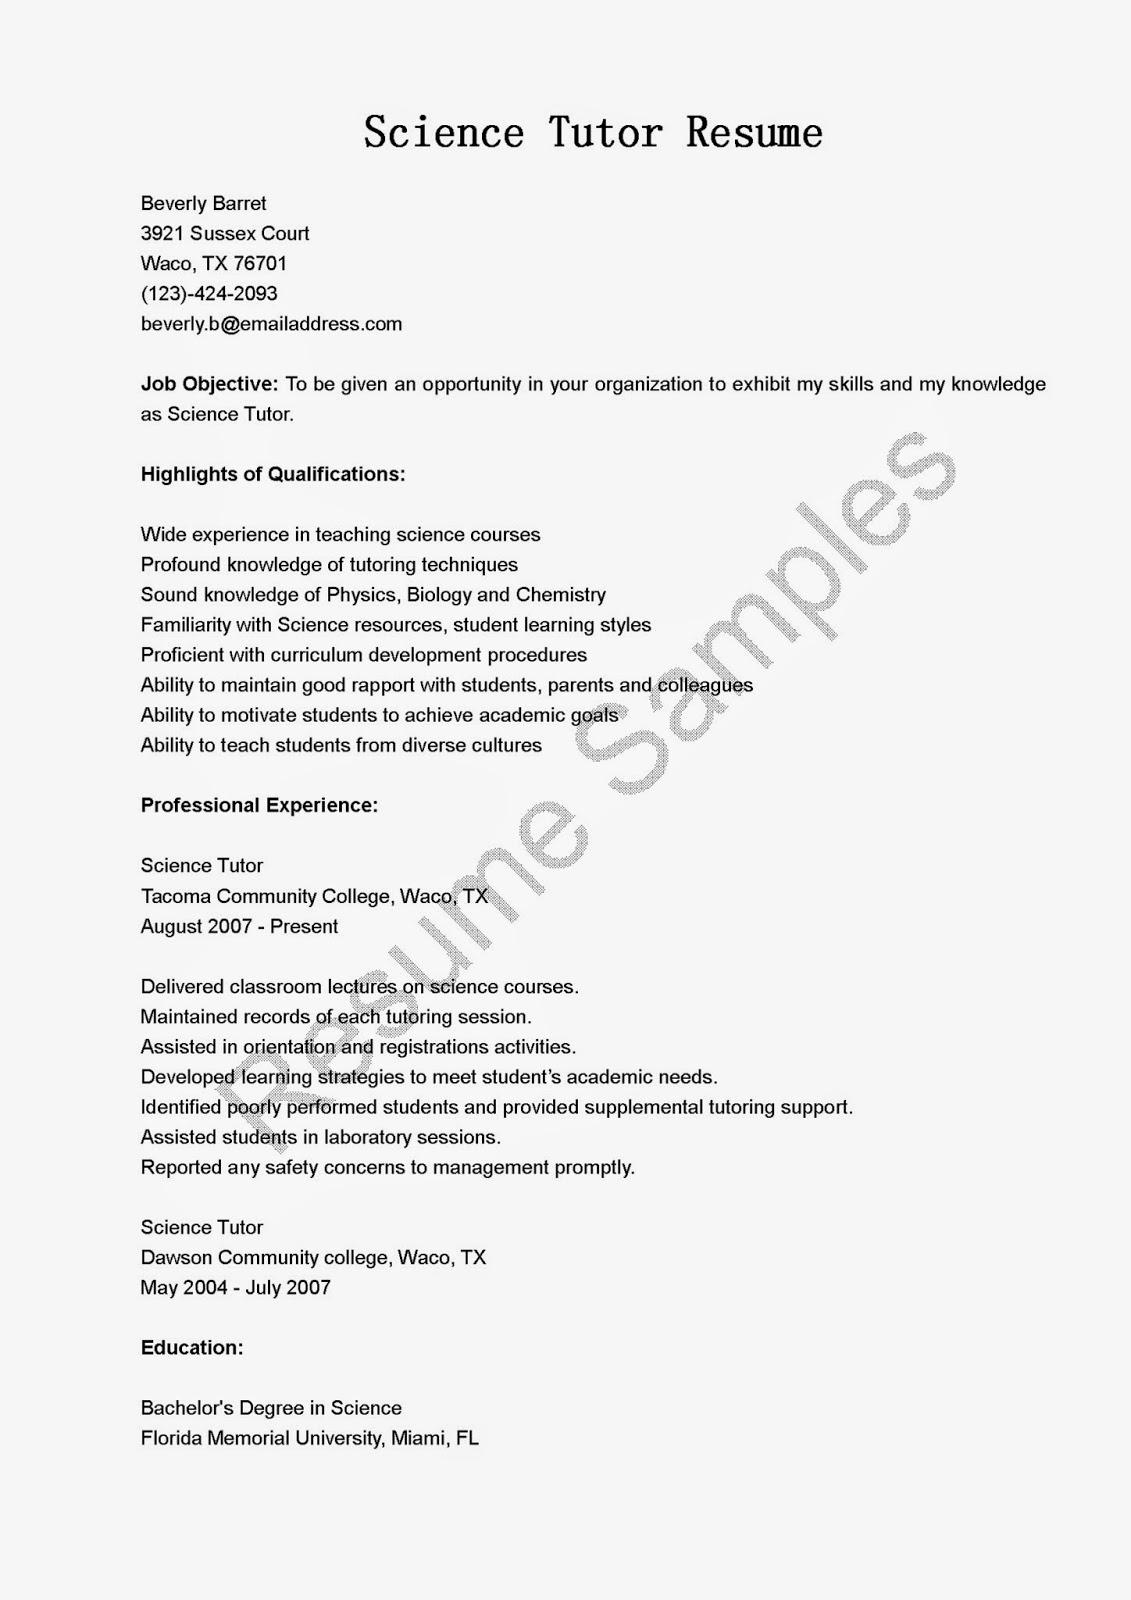 resume samples  science tutor resume sample